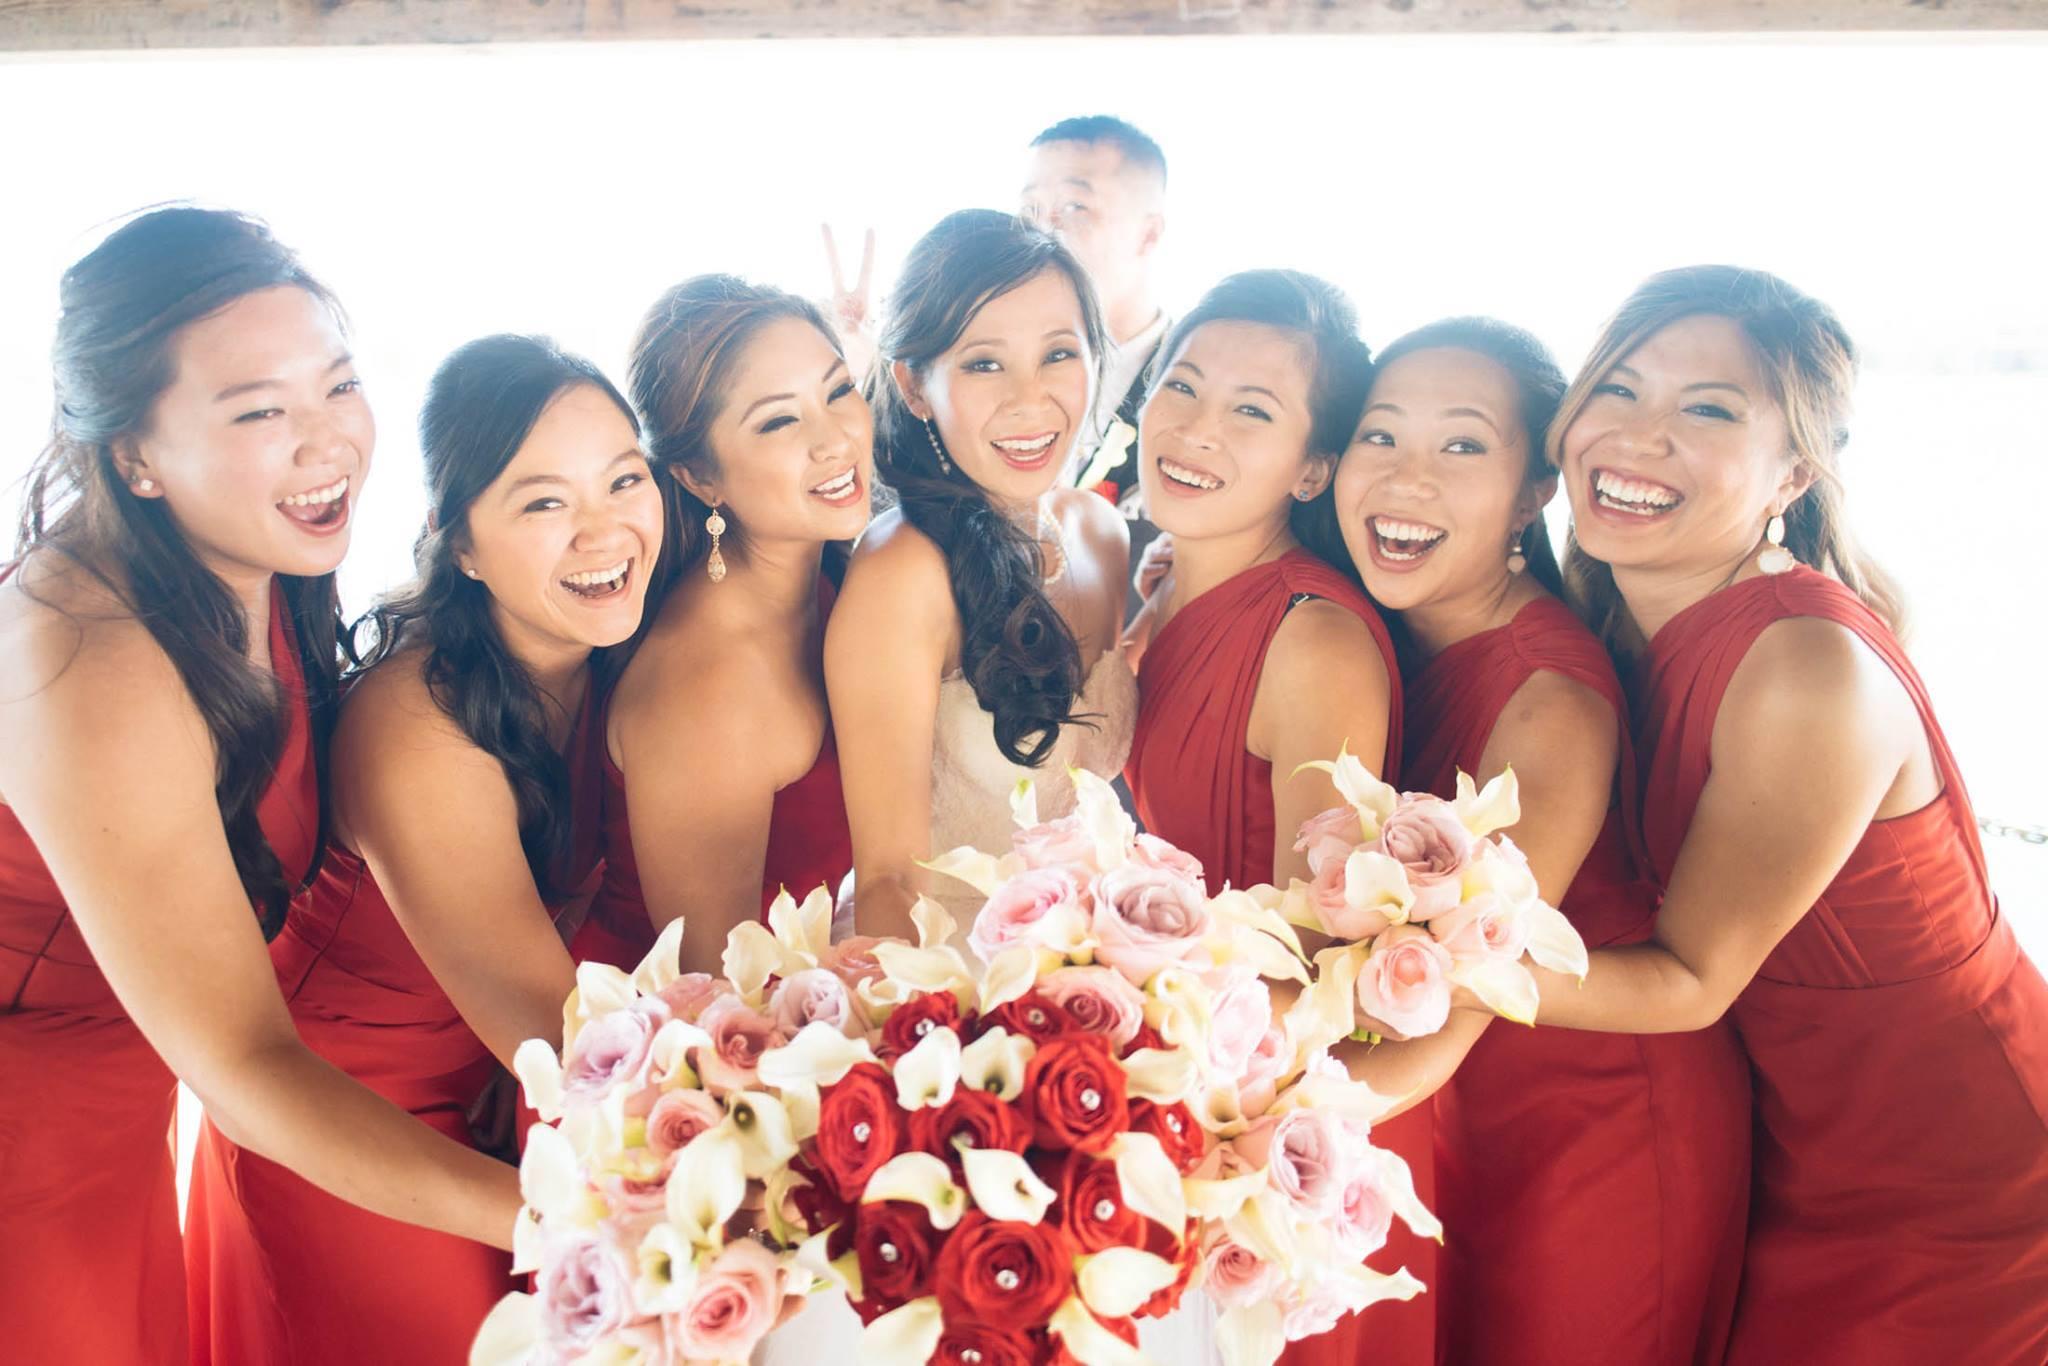 KennyJCStudio - Wedding Day Photography07.jpg